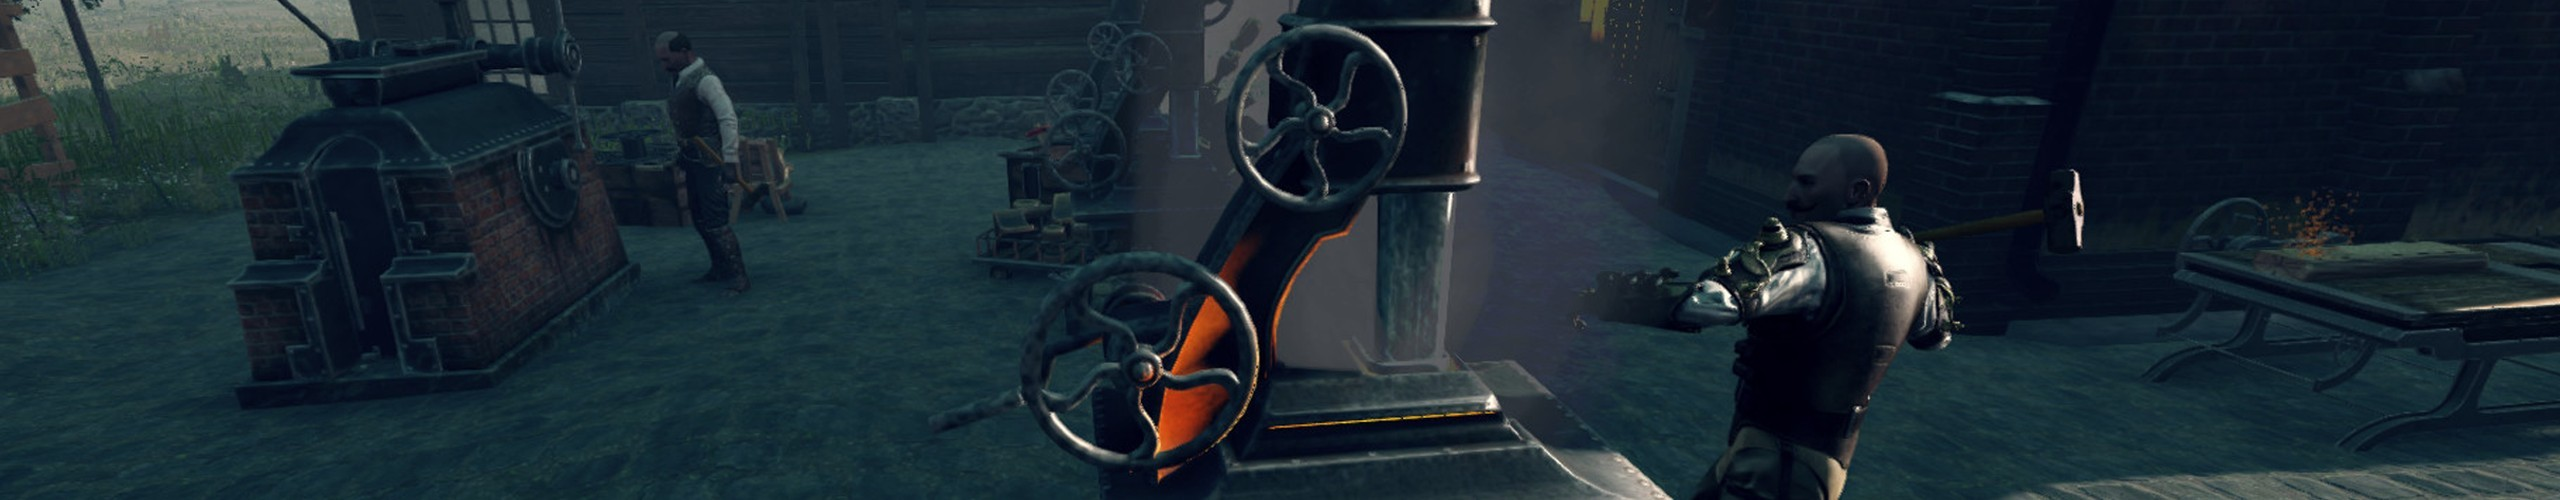 Steam Hammer (B2P)